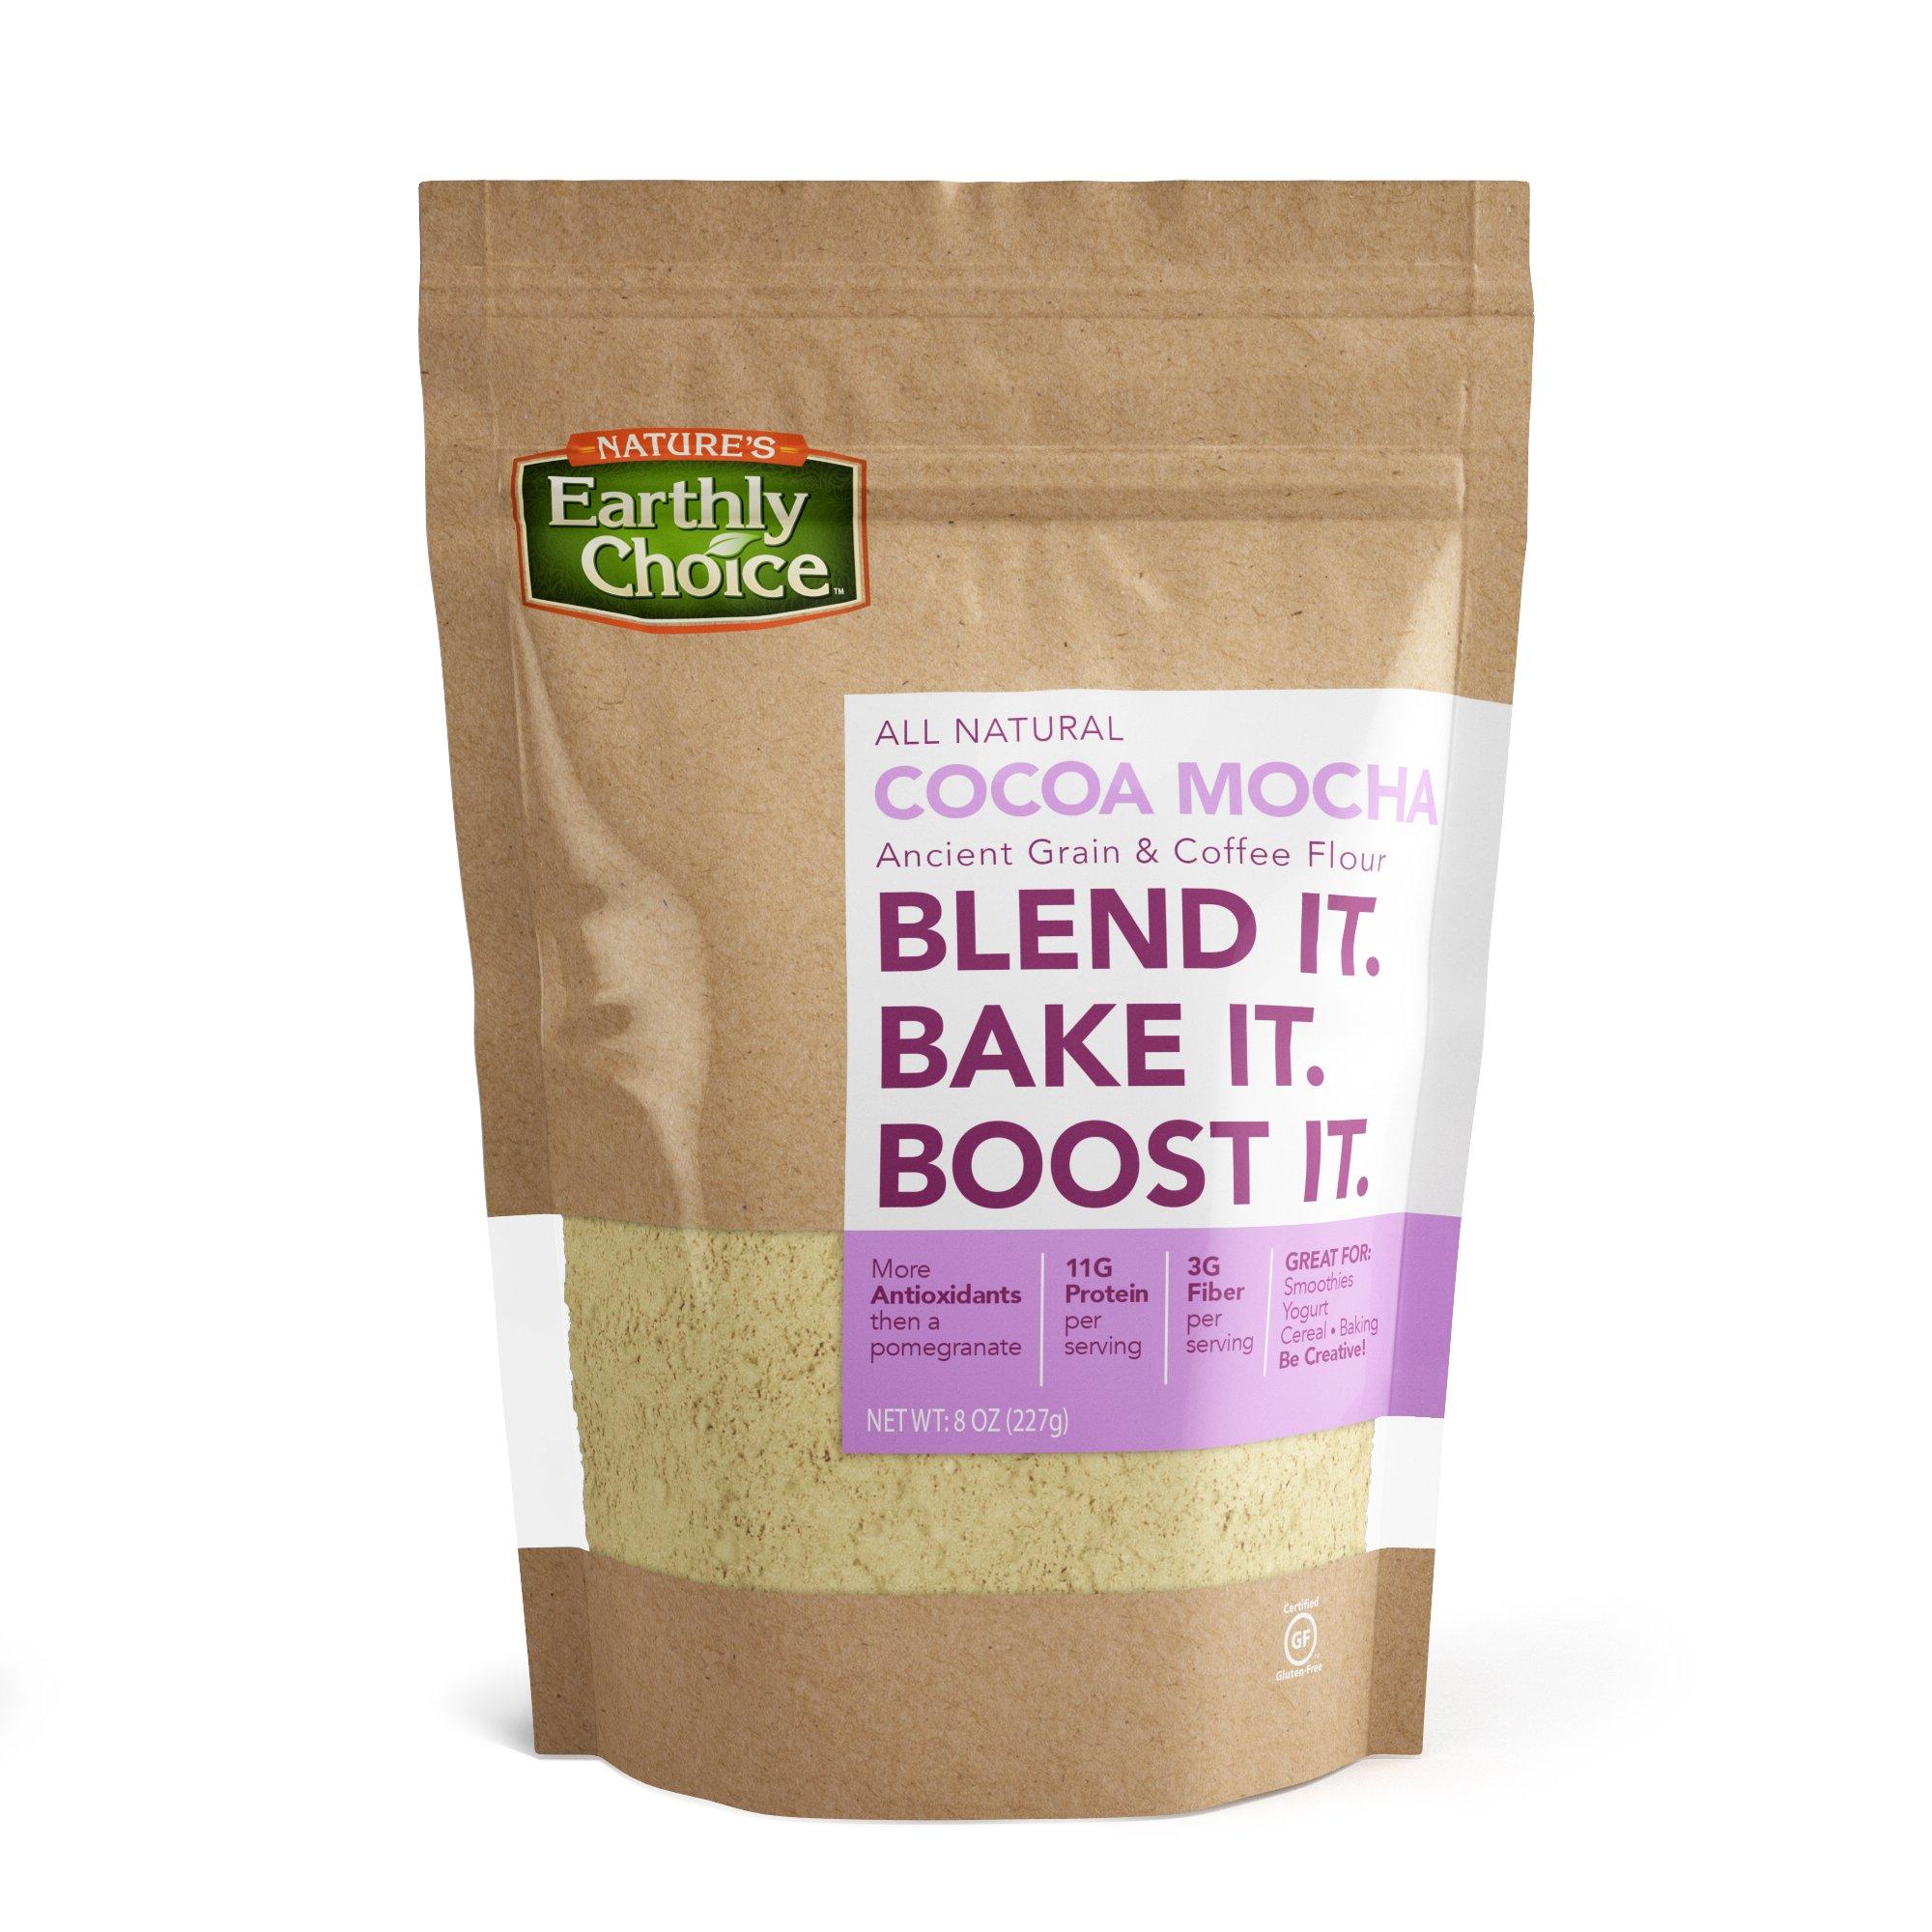 Nature's Earthly Choice Cocoa Mocha, 8 Ounce